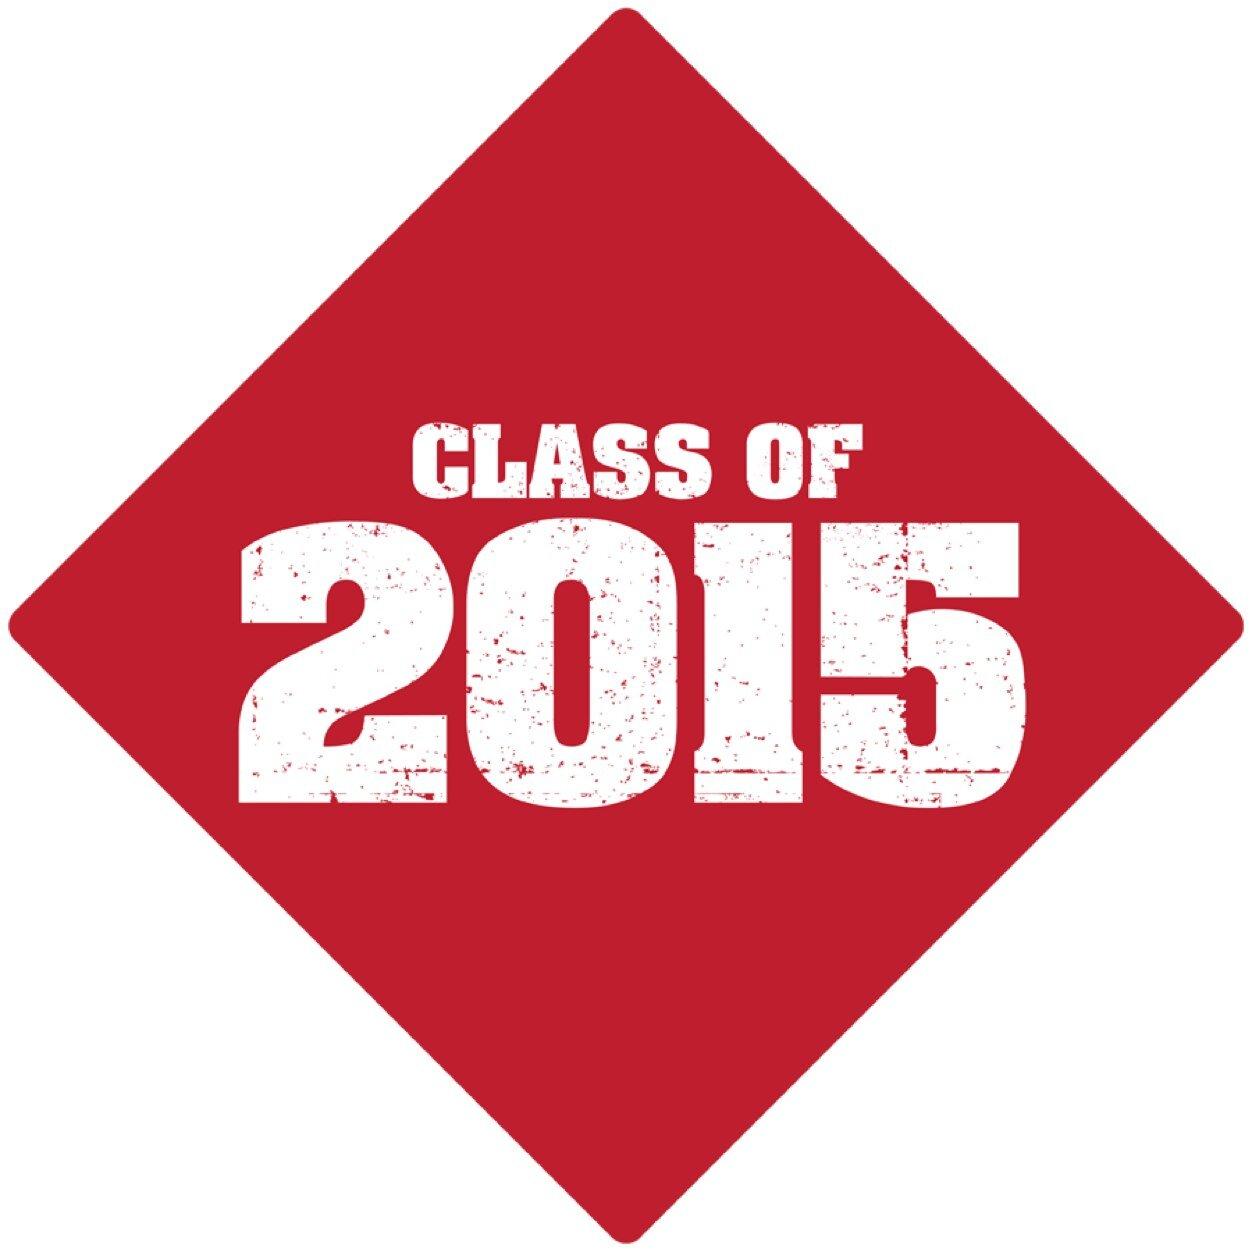 class of 2035 Voya solution 2035 portfolio - adviser class release date 12-31-17.